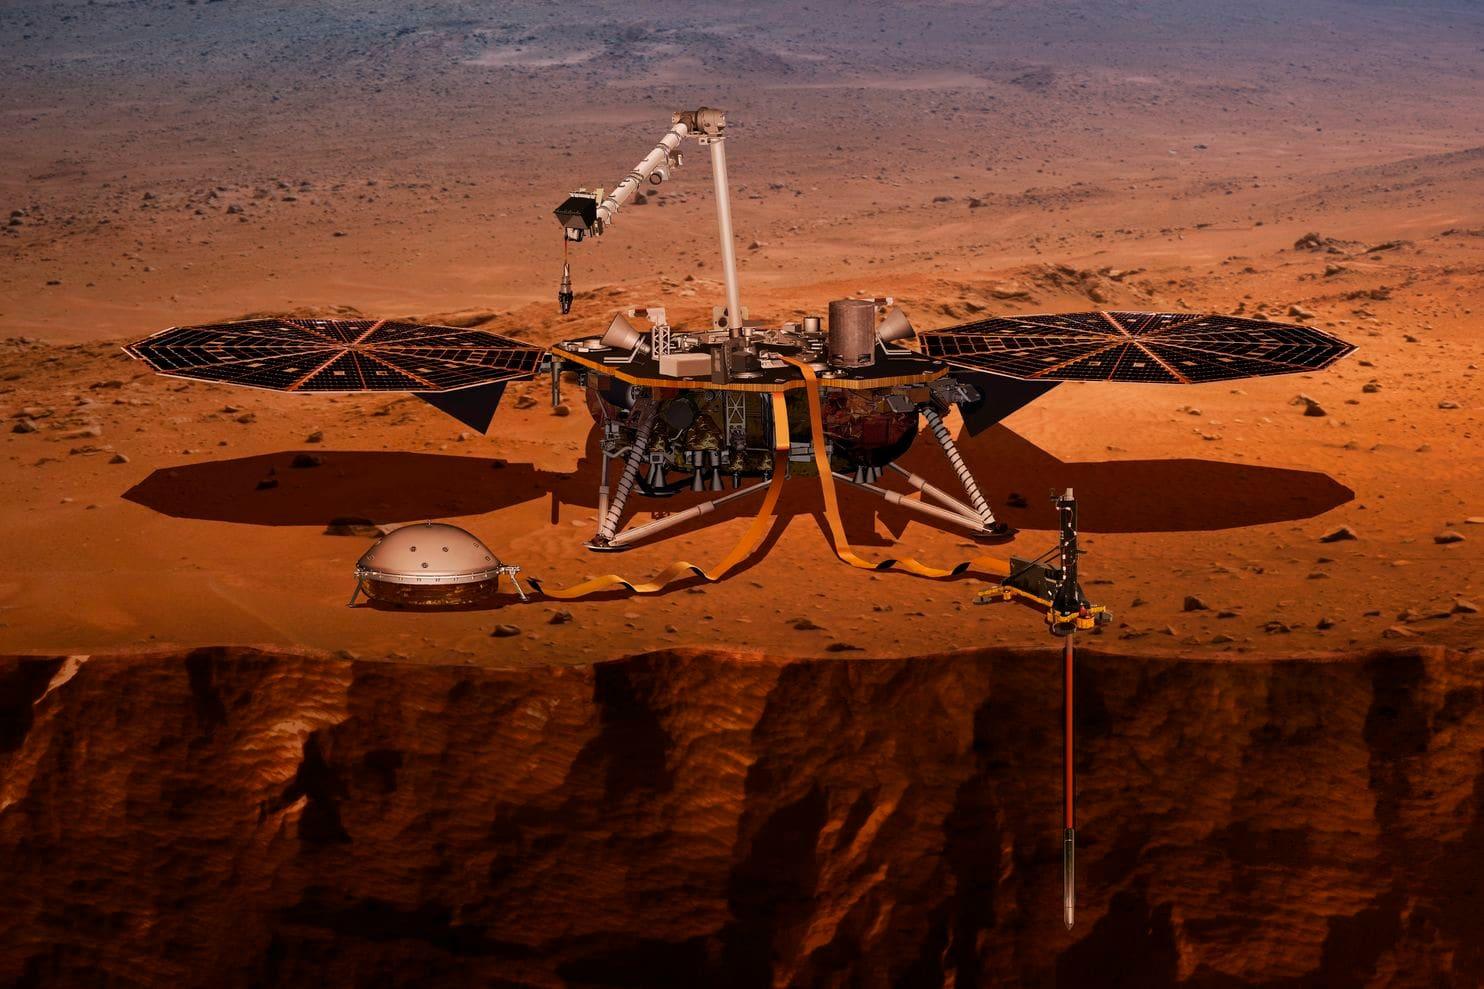 An illustration of NASA's InSight lander drilling into the surface of Mars. (NASA via AP)